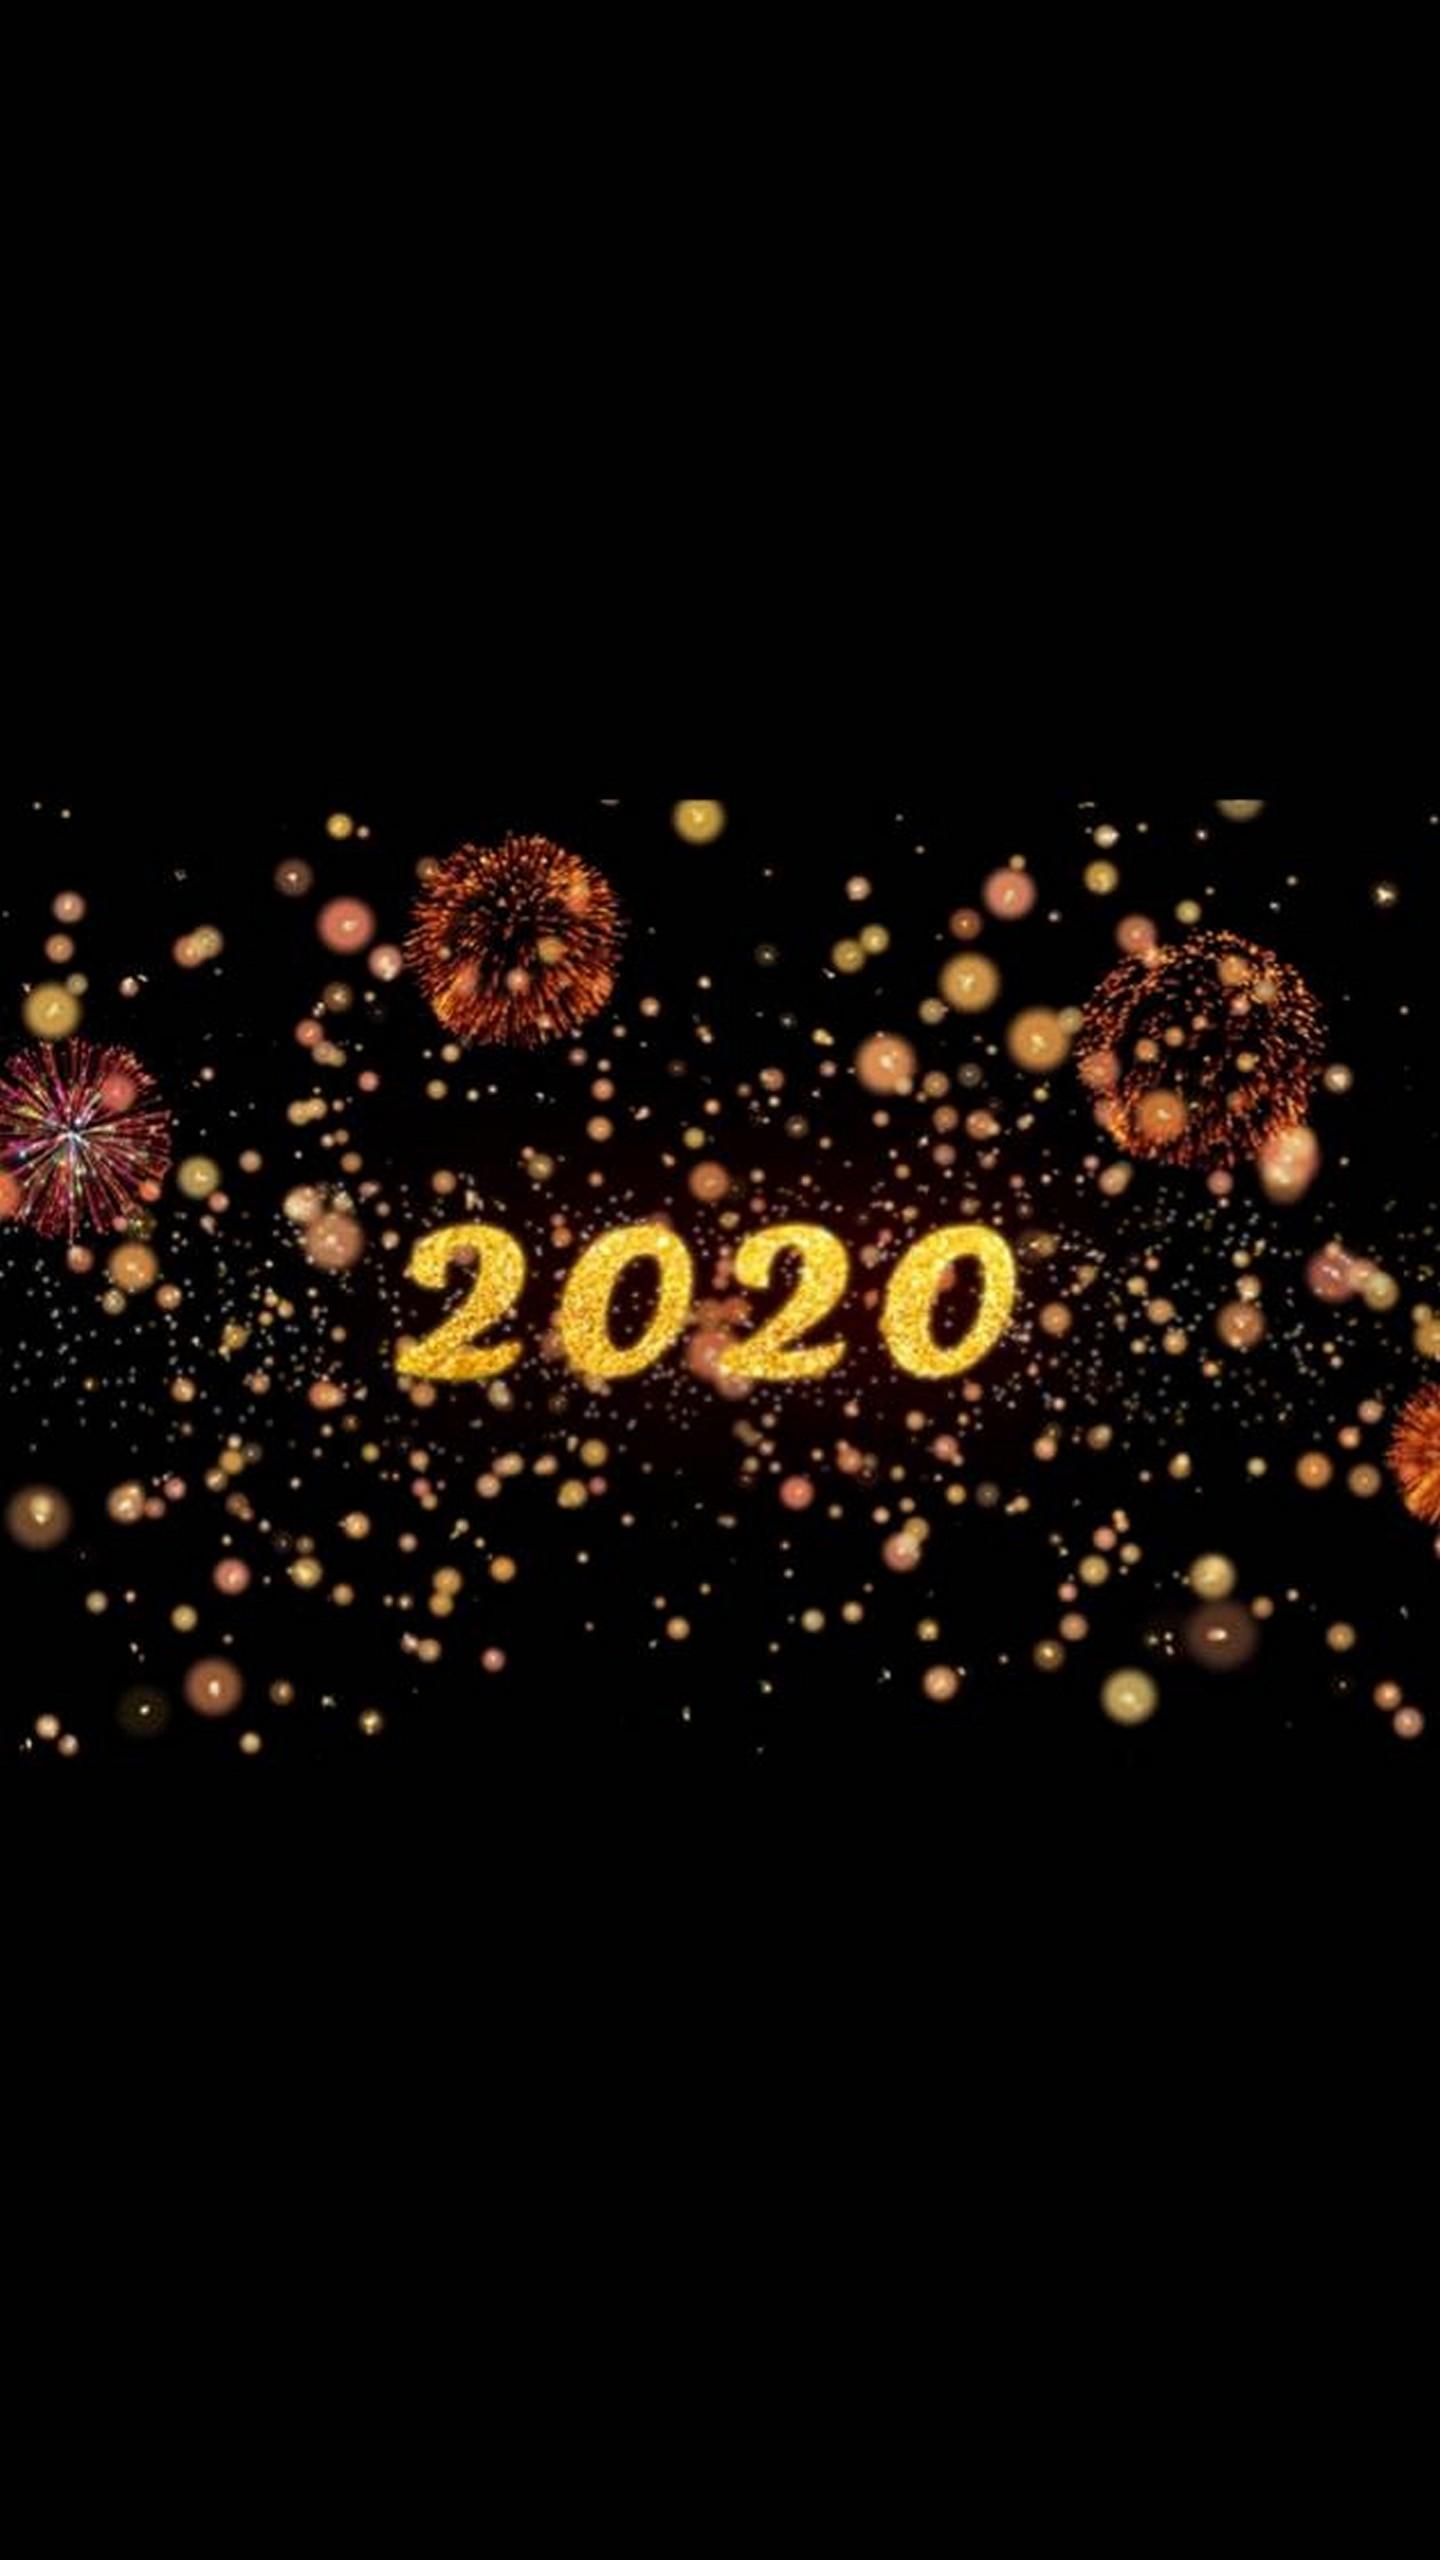 Happy New Year 2020 Wallpaper 11 1440x2560